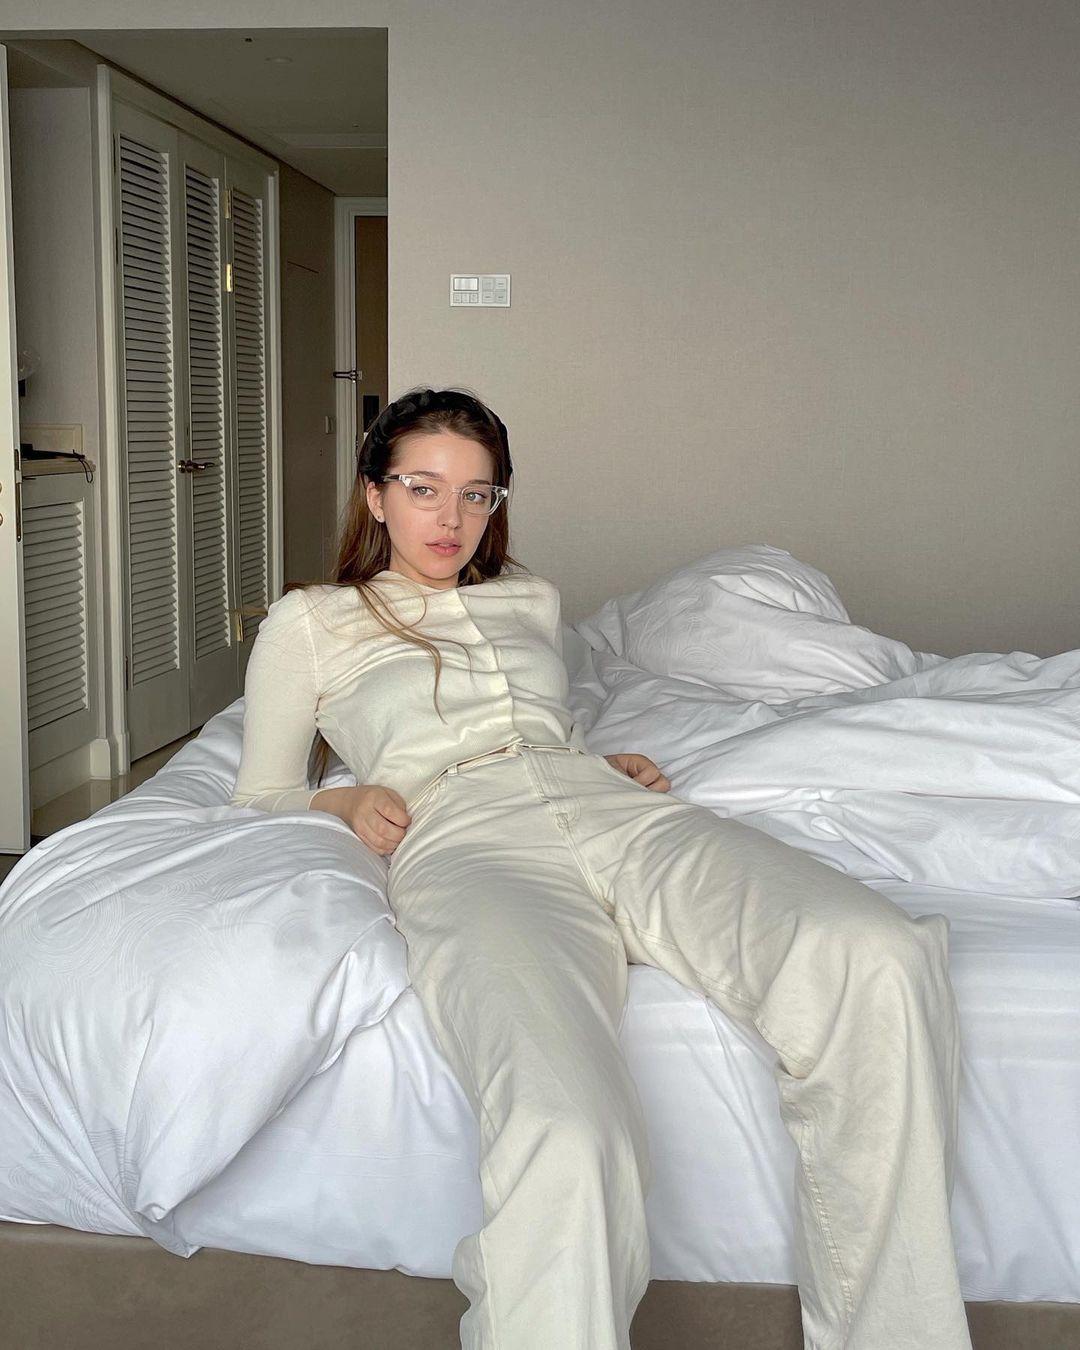 Angelina-Danilova-Wallpapers-Insta-Fit-Bio-3